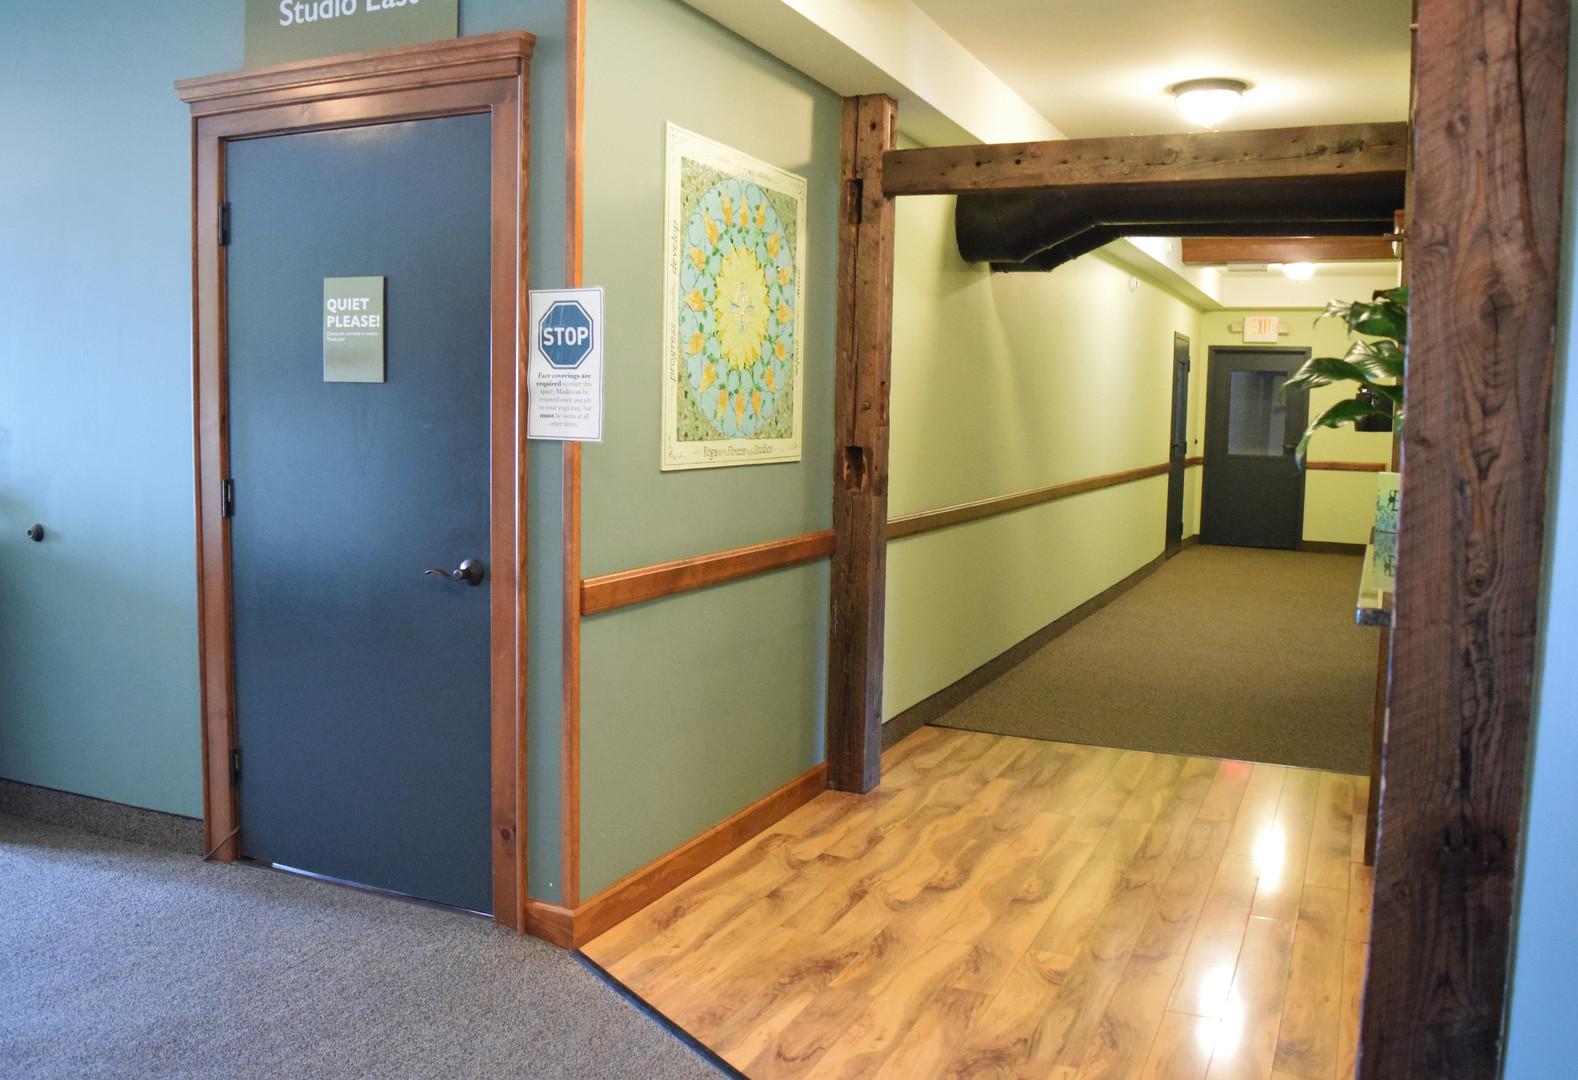 Hallways to rooms 2 & 3